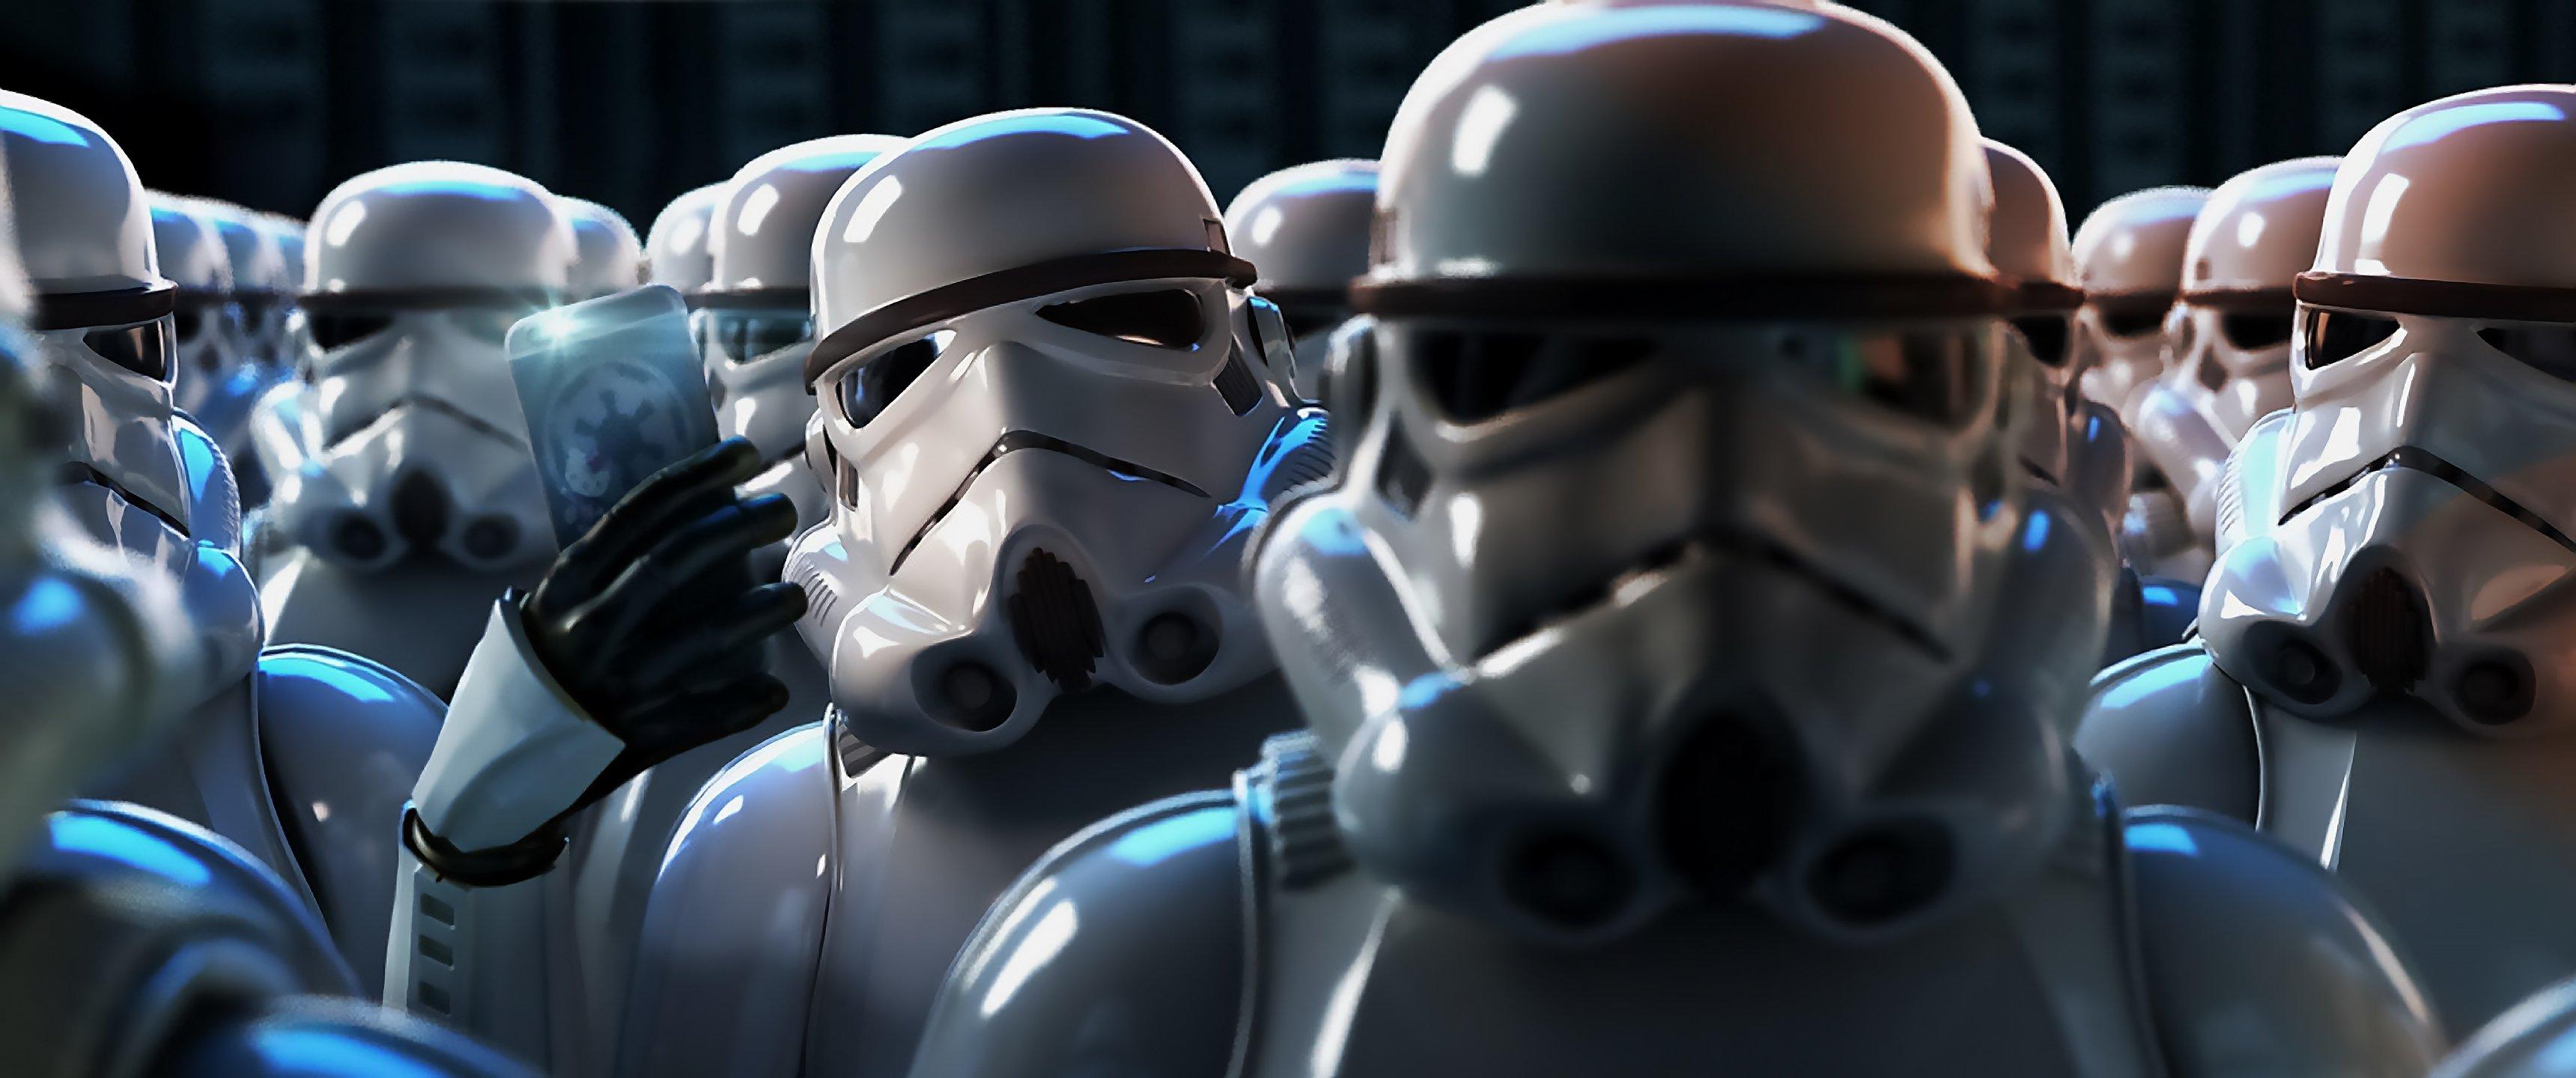 Star Wars Ultrawide Wallpaper: 21 9 Wallpapers 3440x1440